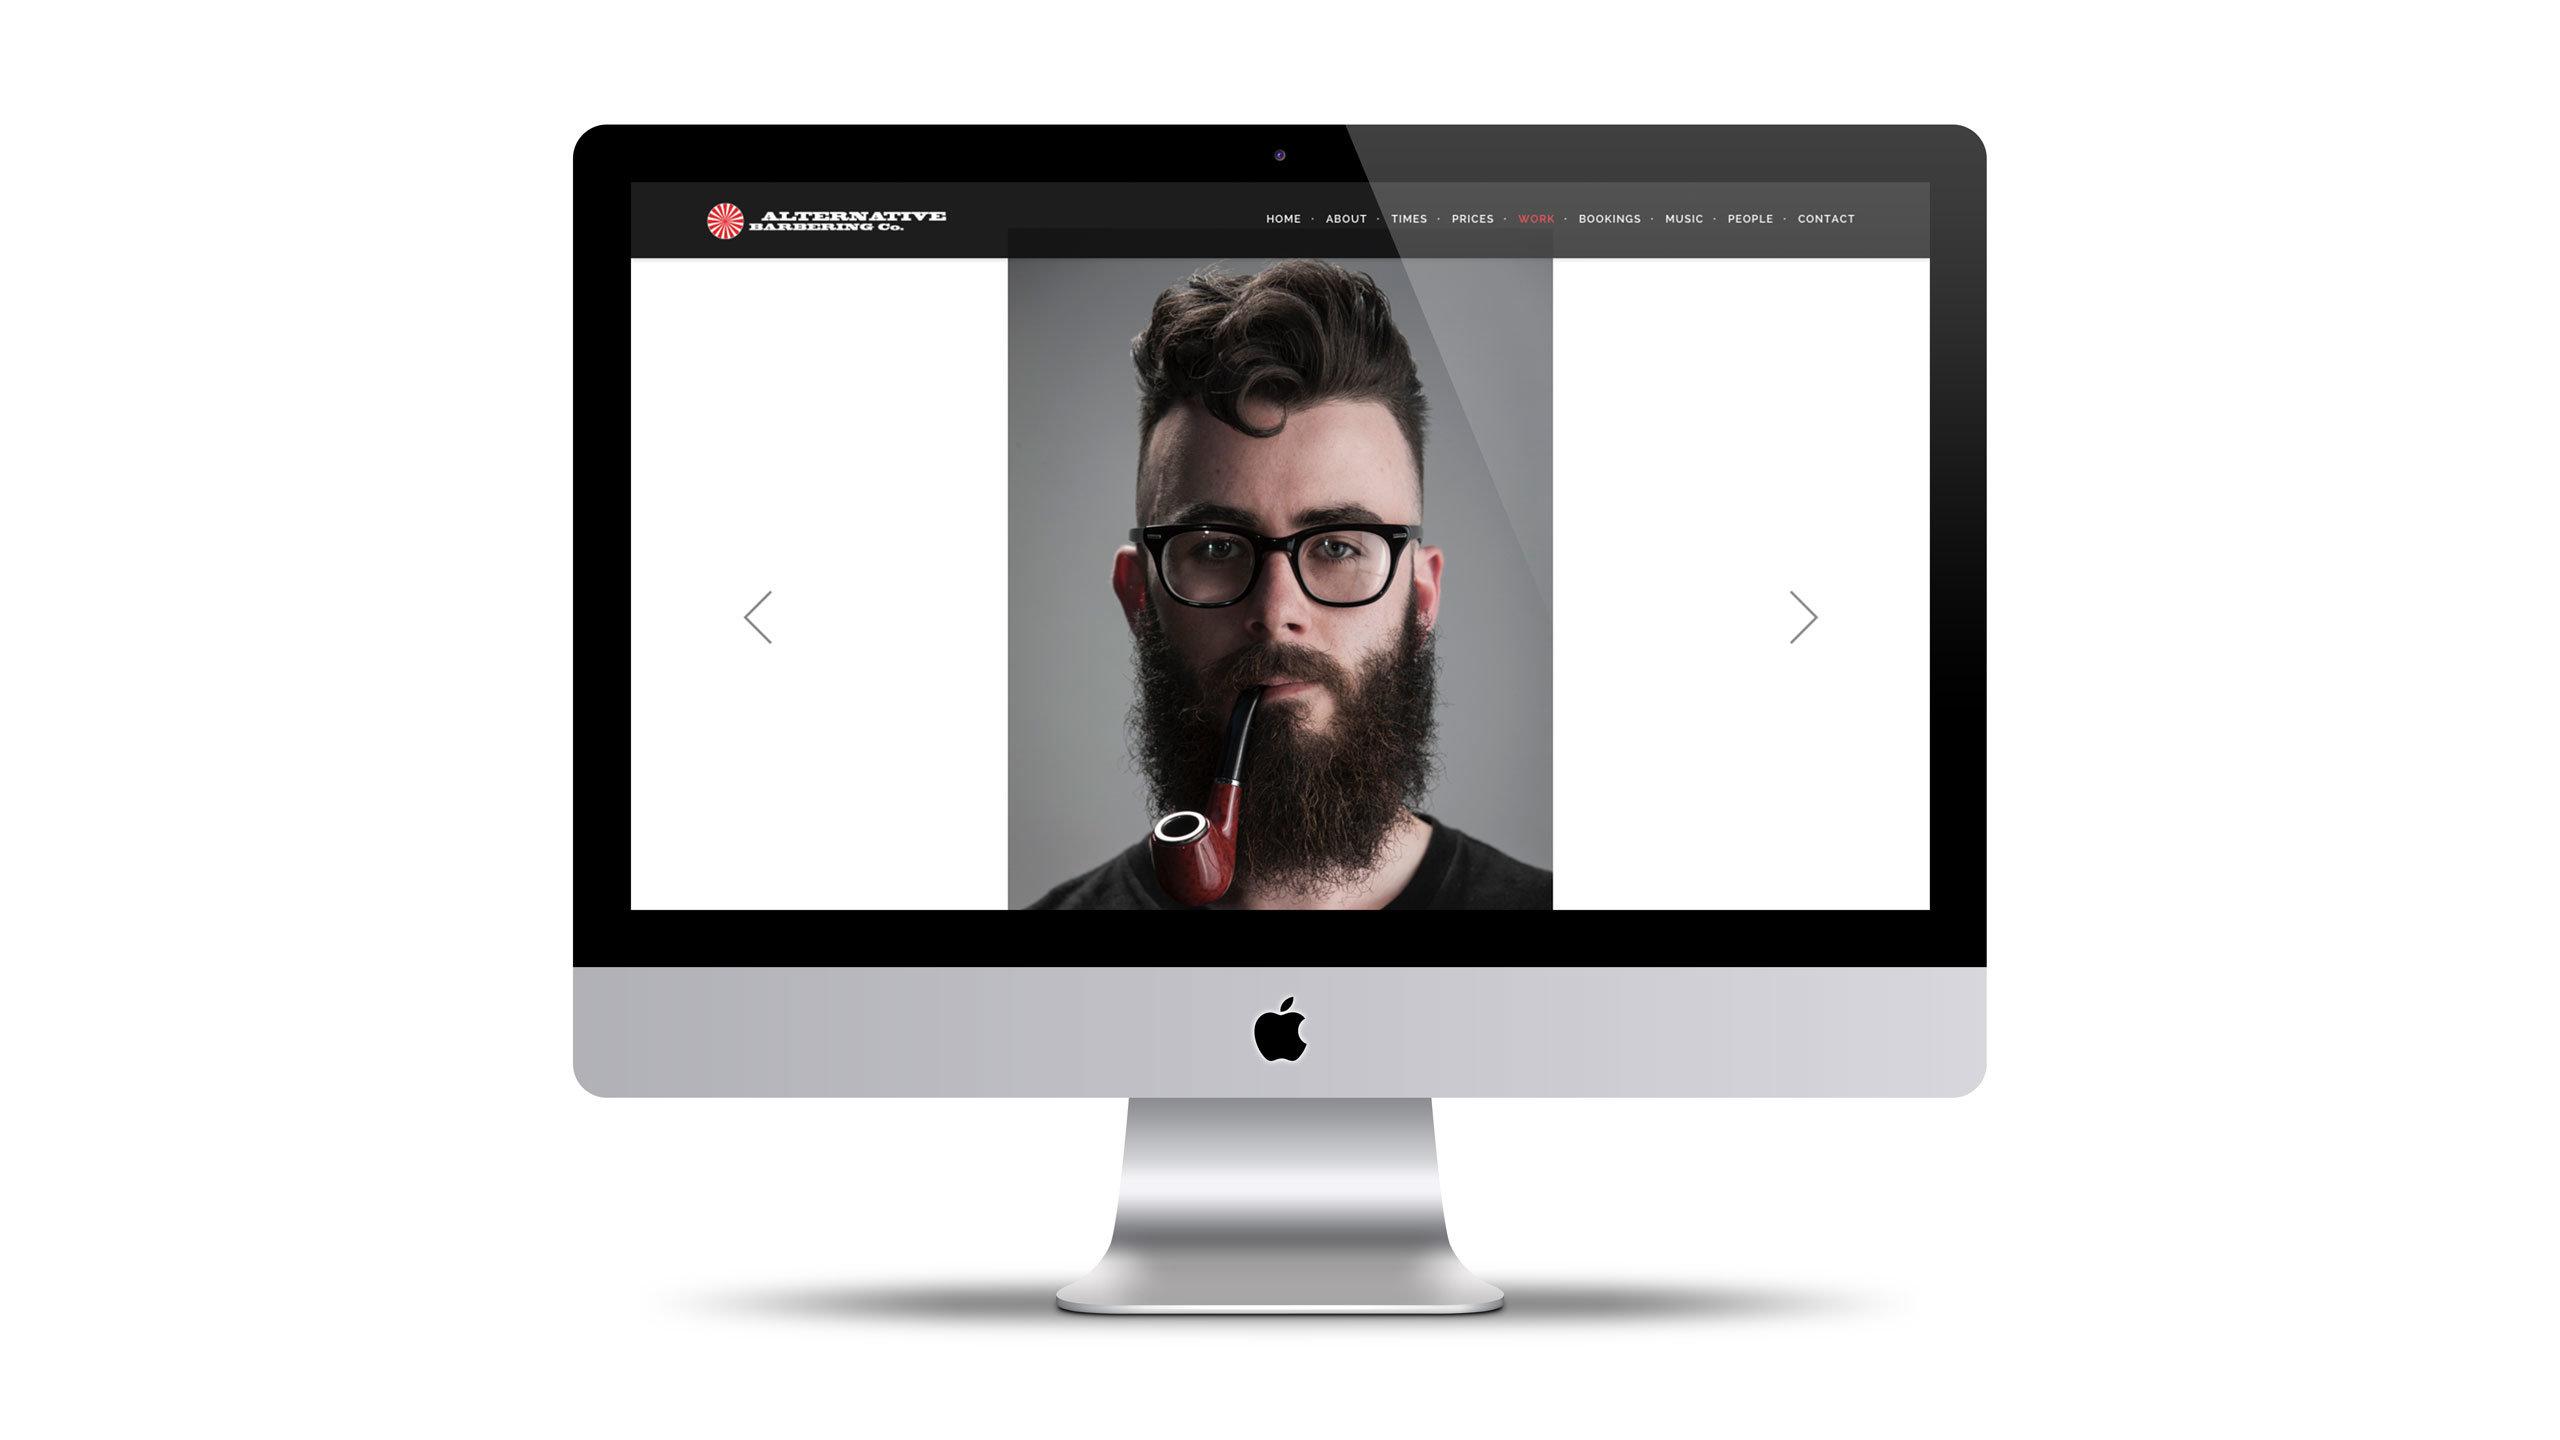 barbershop website design beardy pipe man page alternative barbering co